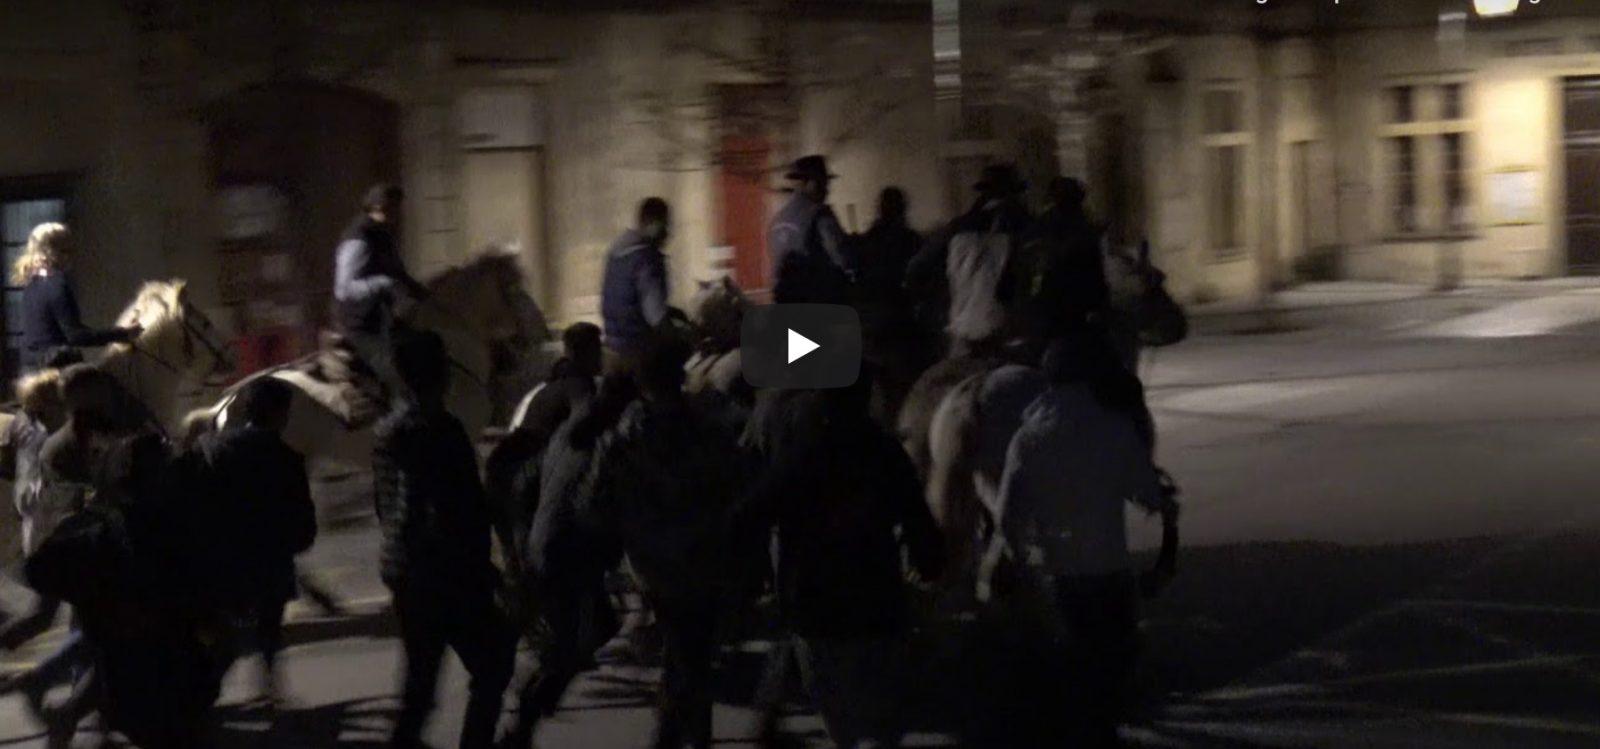 CAVEIRAC (08/03/2019) – Retour en vidéo sur la bandido